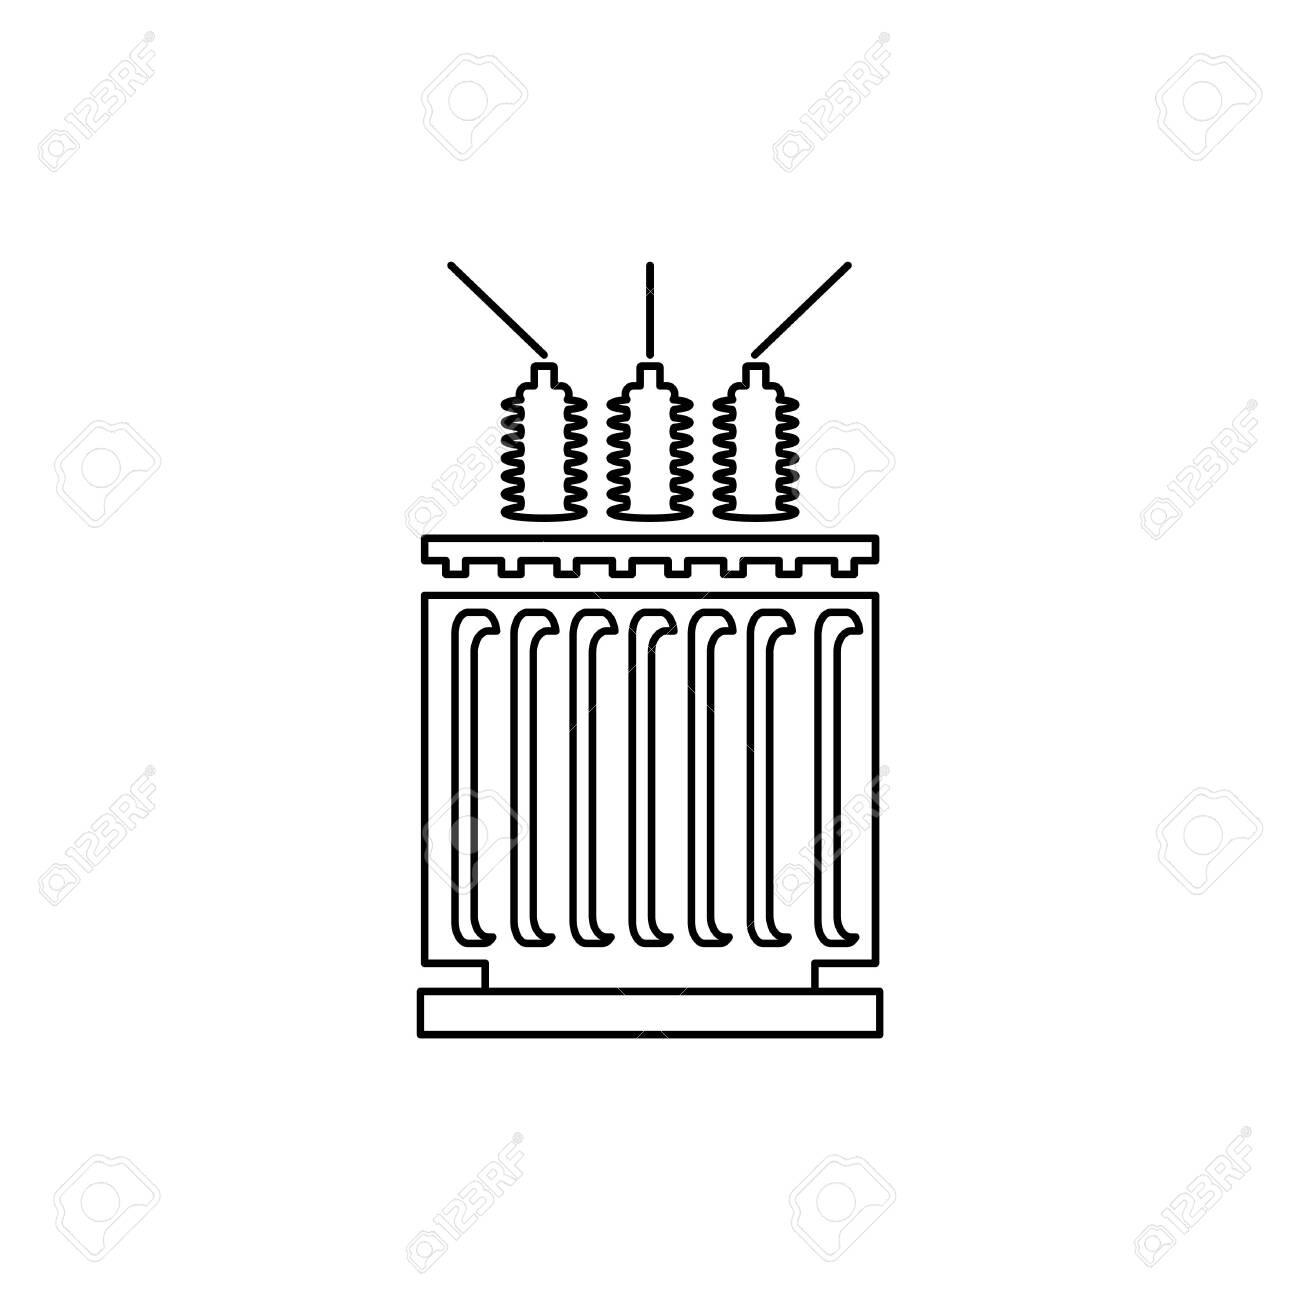 Electric transformer icon - vector illustration. - 152338202